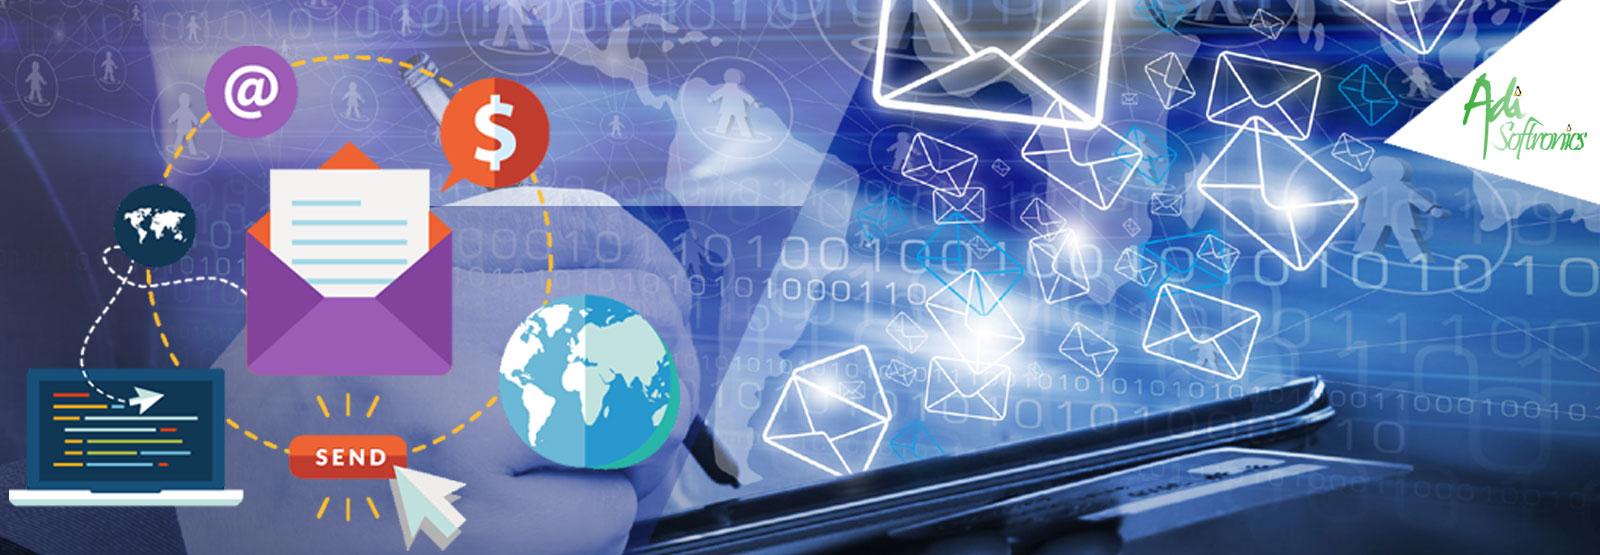 Eco Mails - AdiSoftronics Web Development Company In Delhi